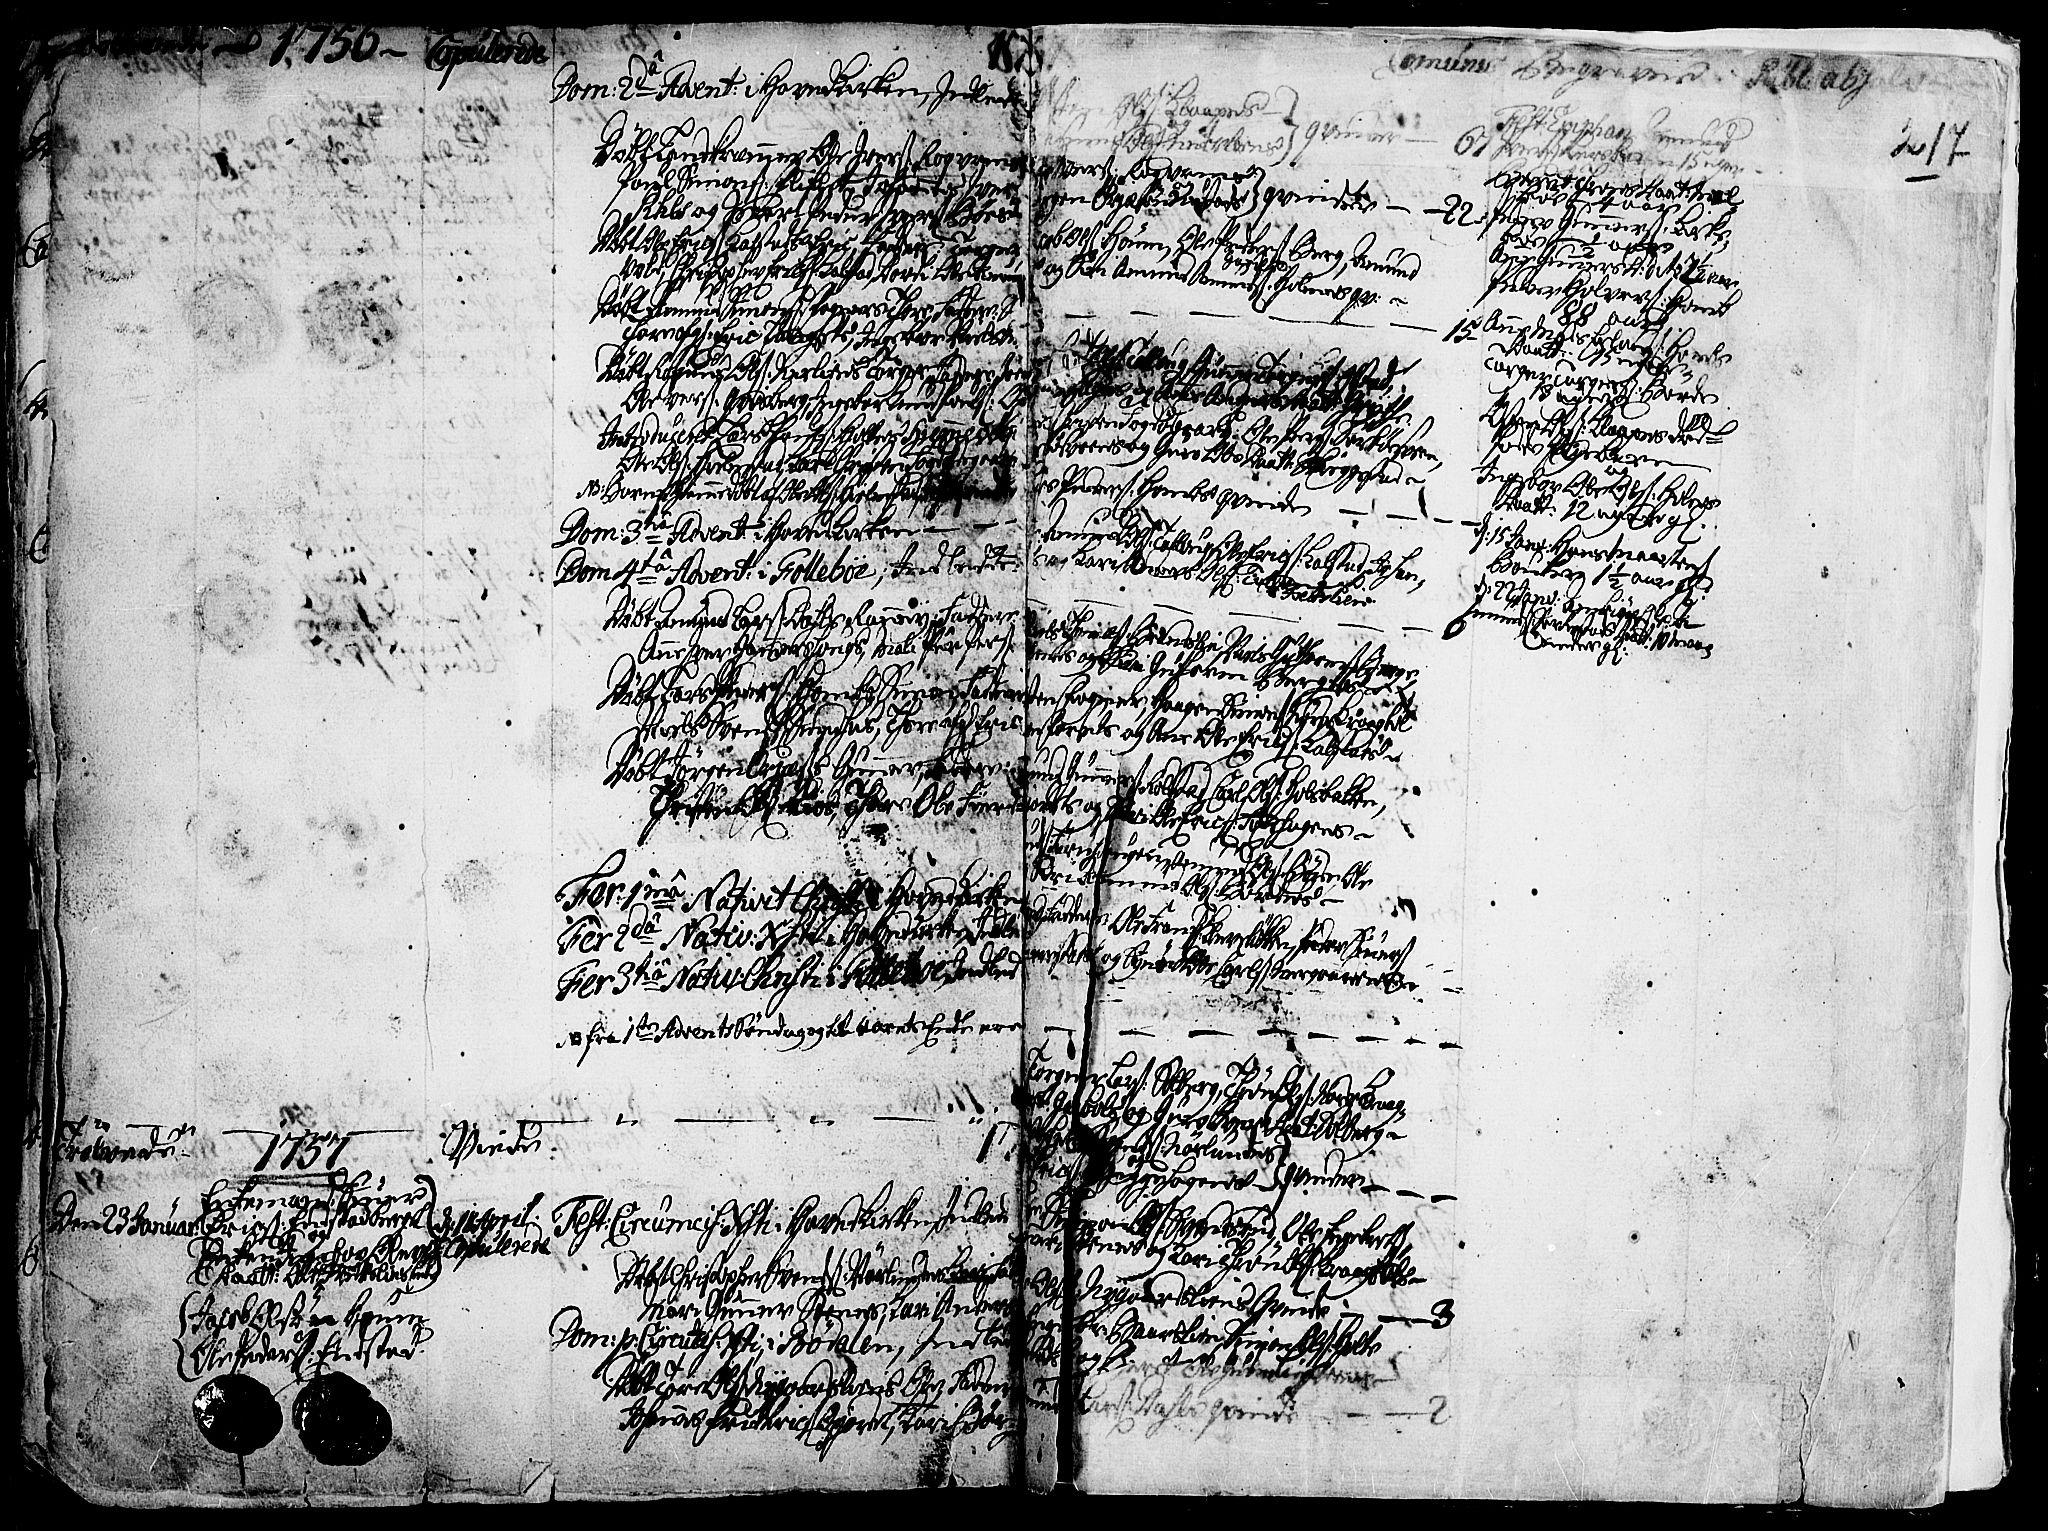 SAH, Gausdal prestekontor, Ministerialbok nr. 2, 1729-1757, s. 217